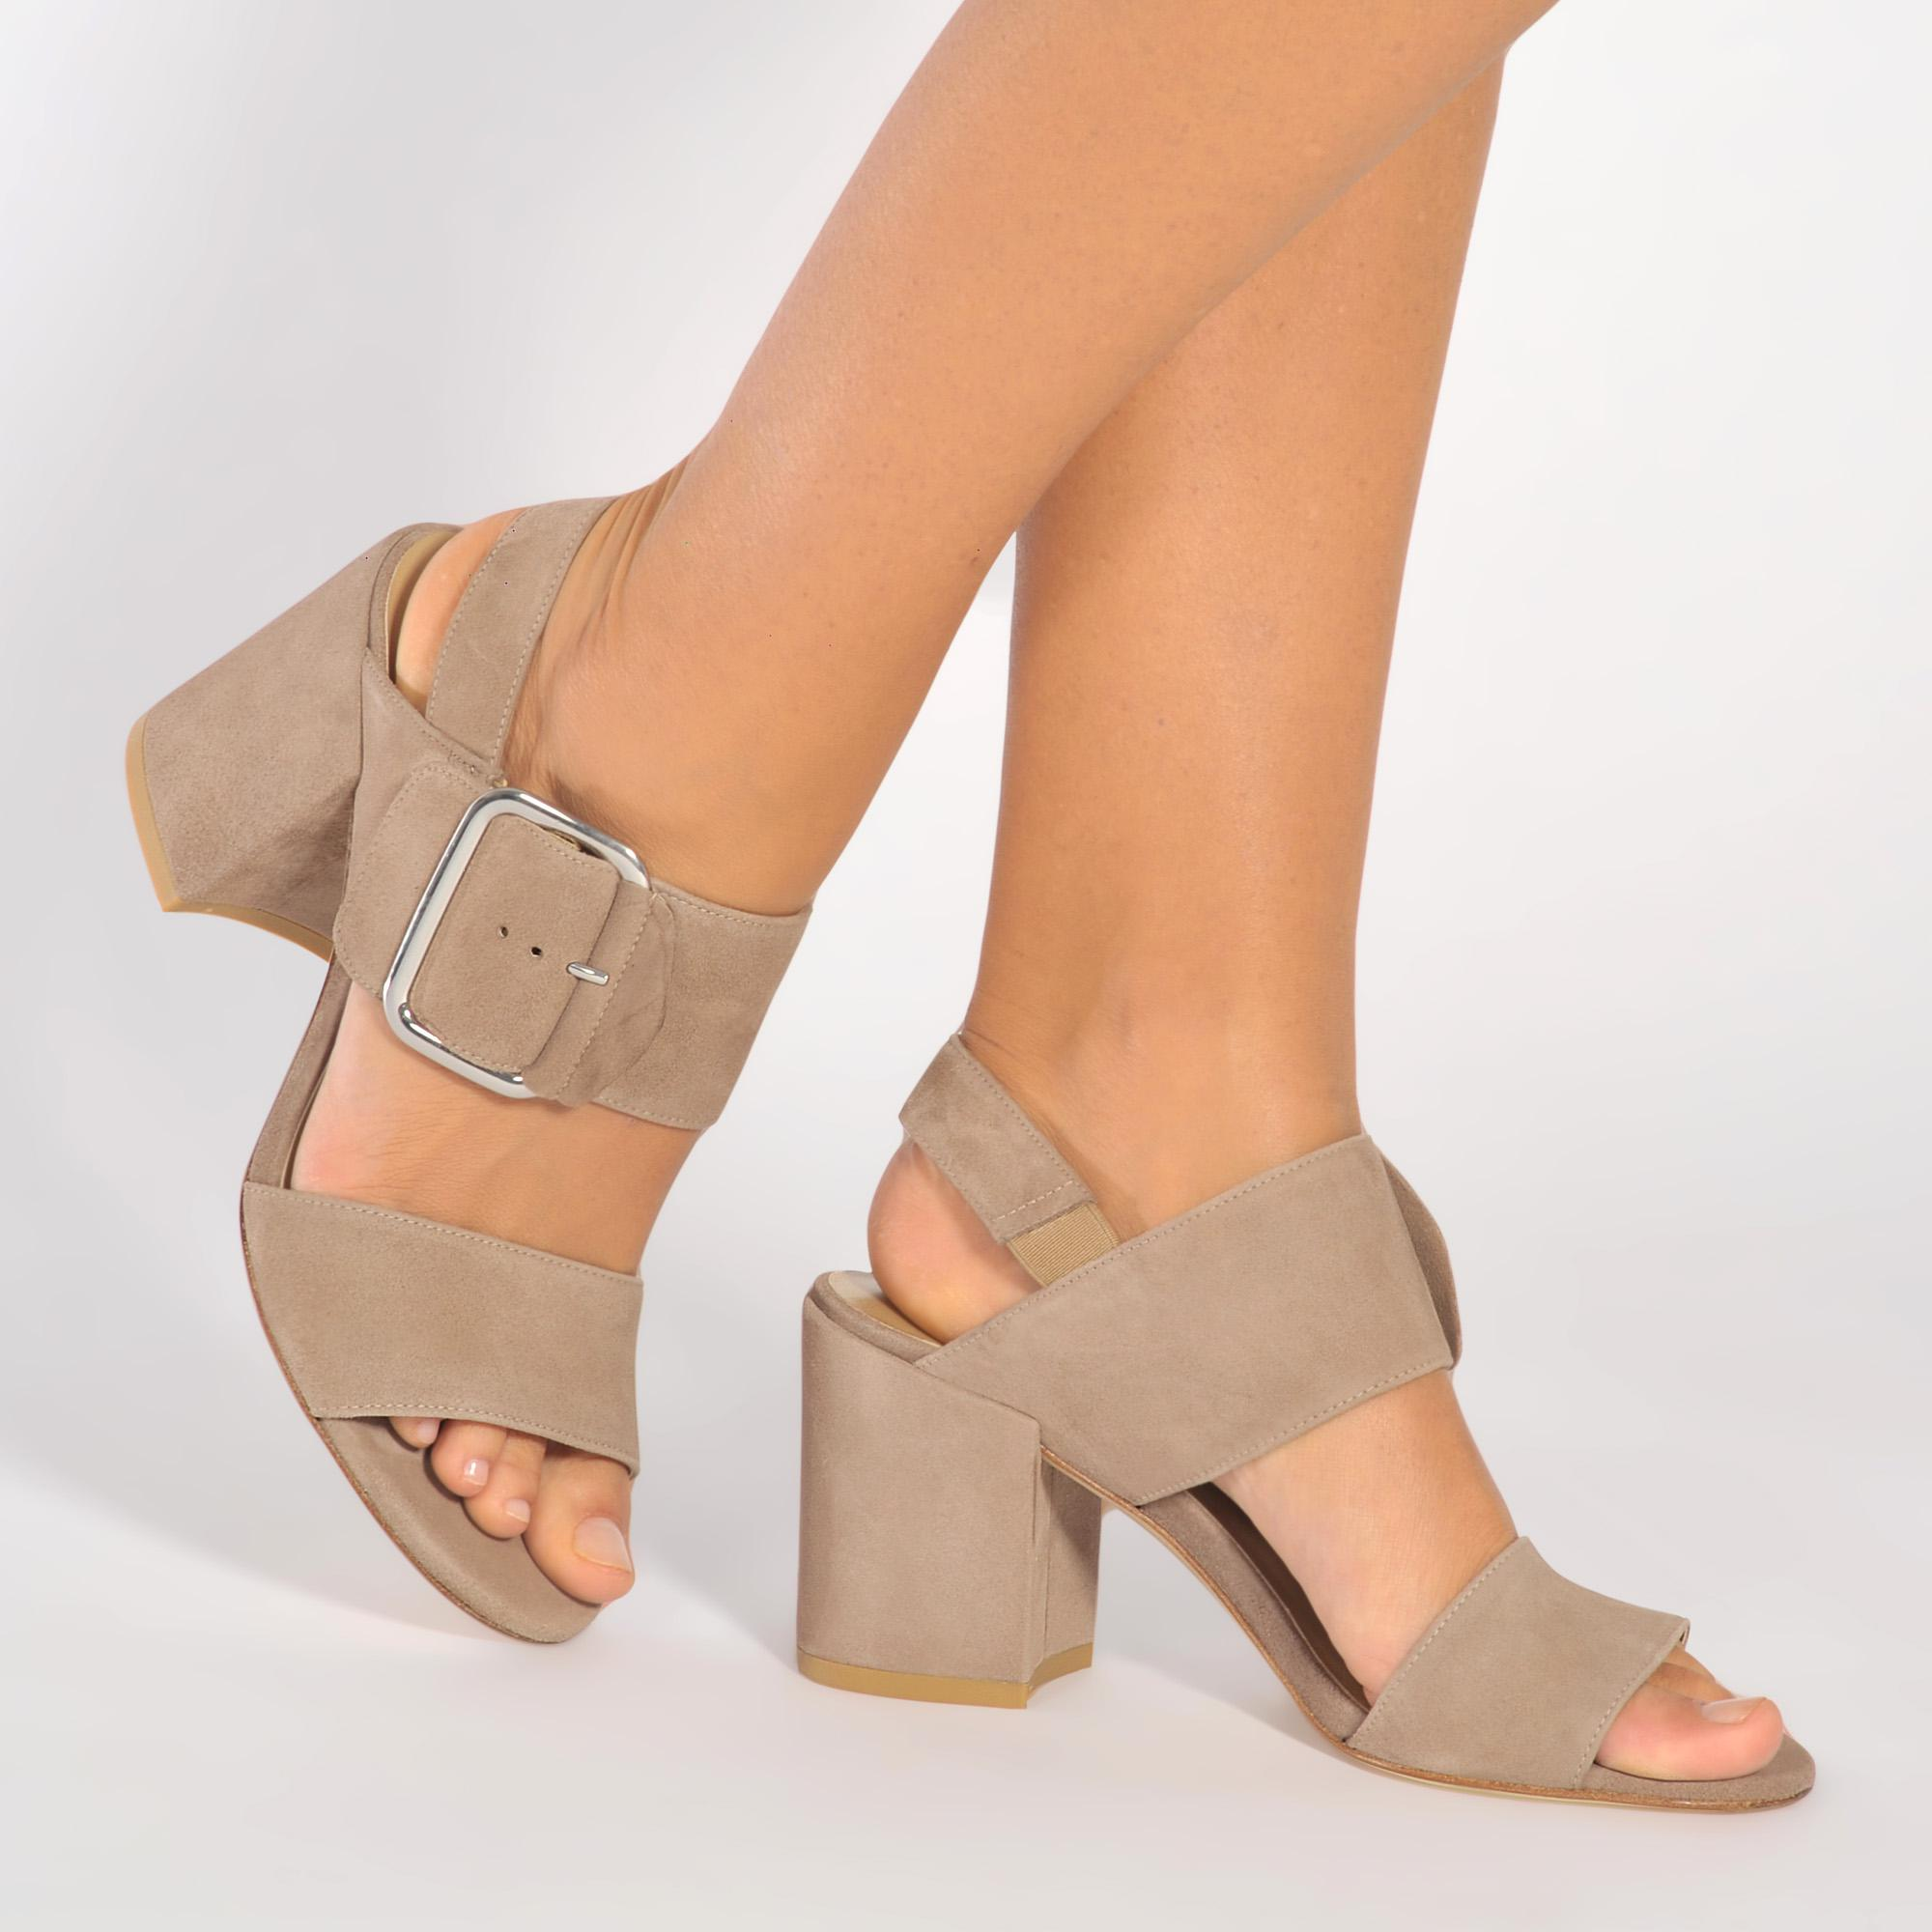 Stuart Weitzman Nudist Patent Leather DOrsay Sandals in